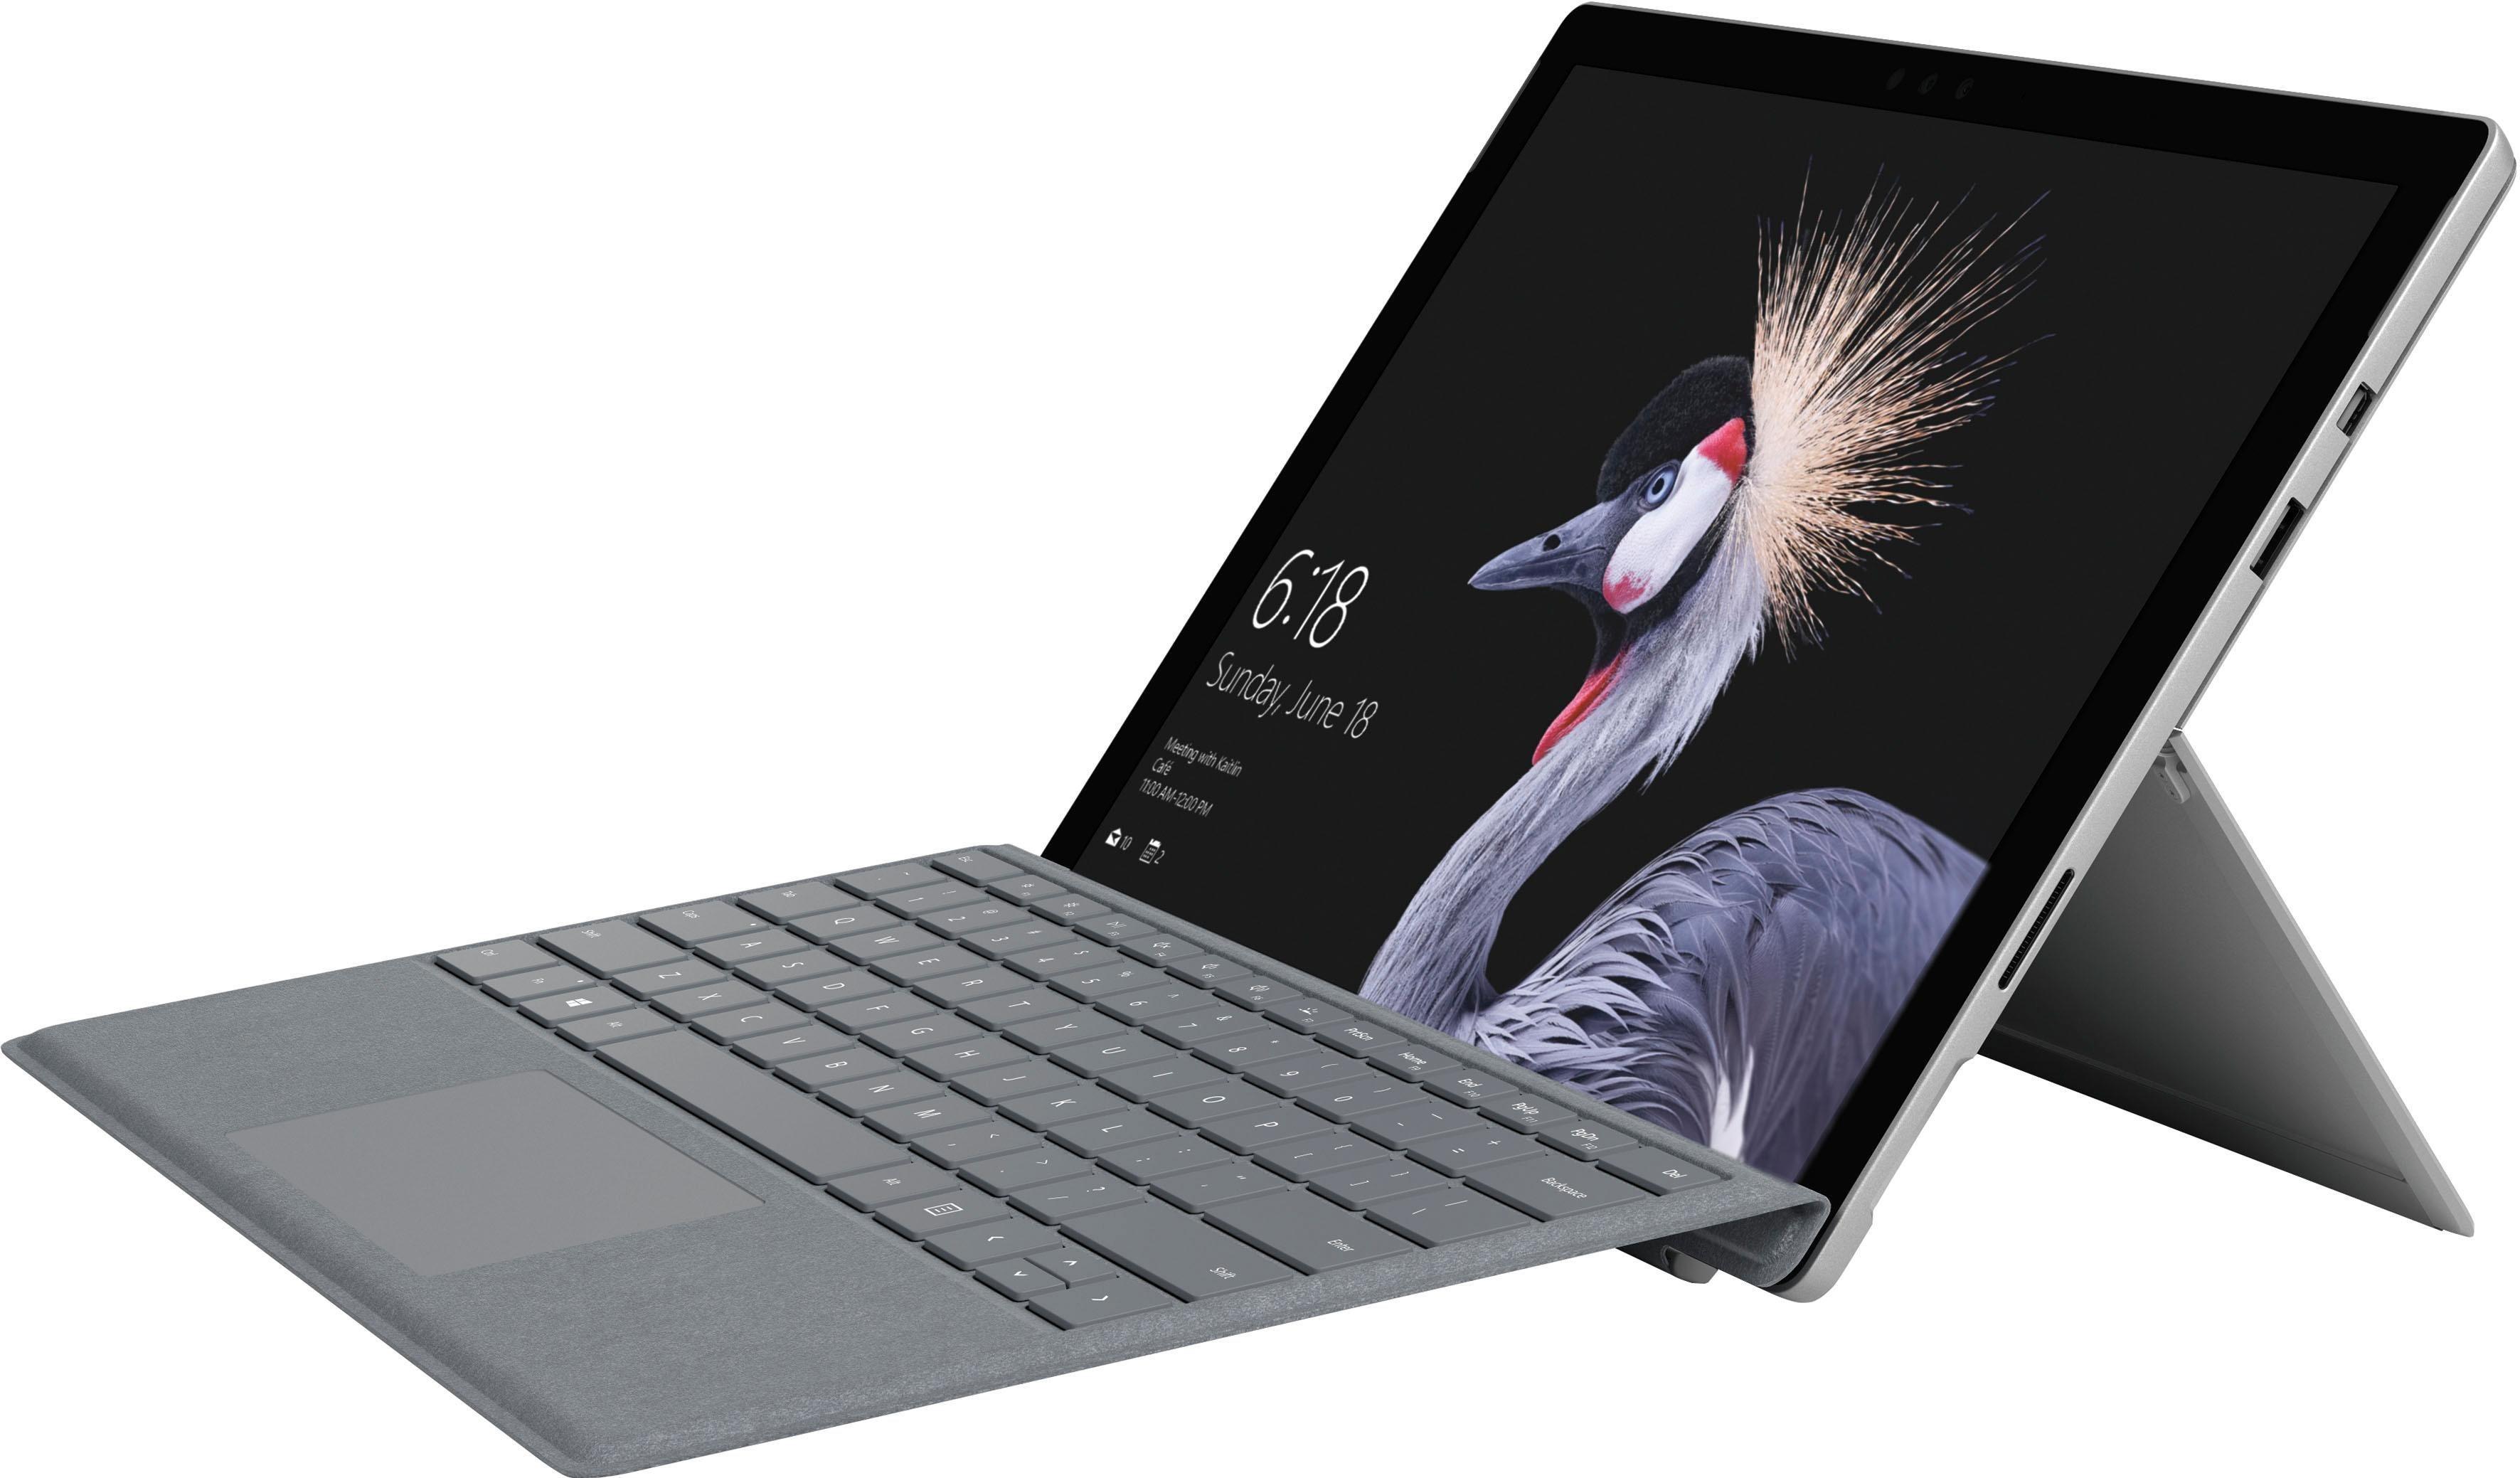 Surface Pro Intel Core i7 1 TB 16 GB RAM Convertible Notebook